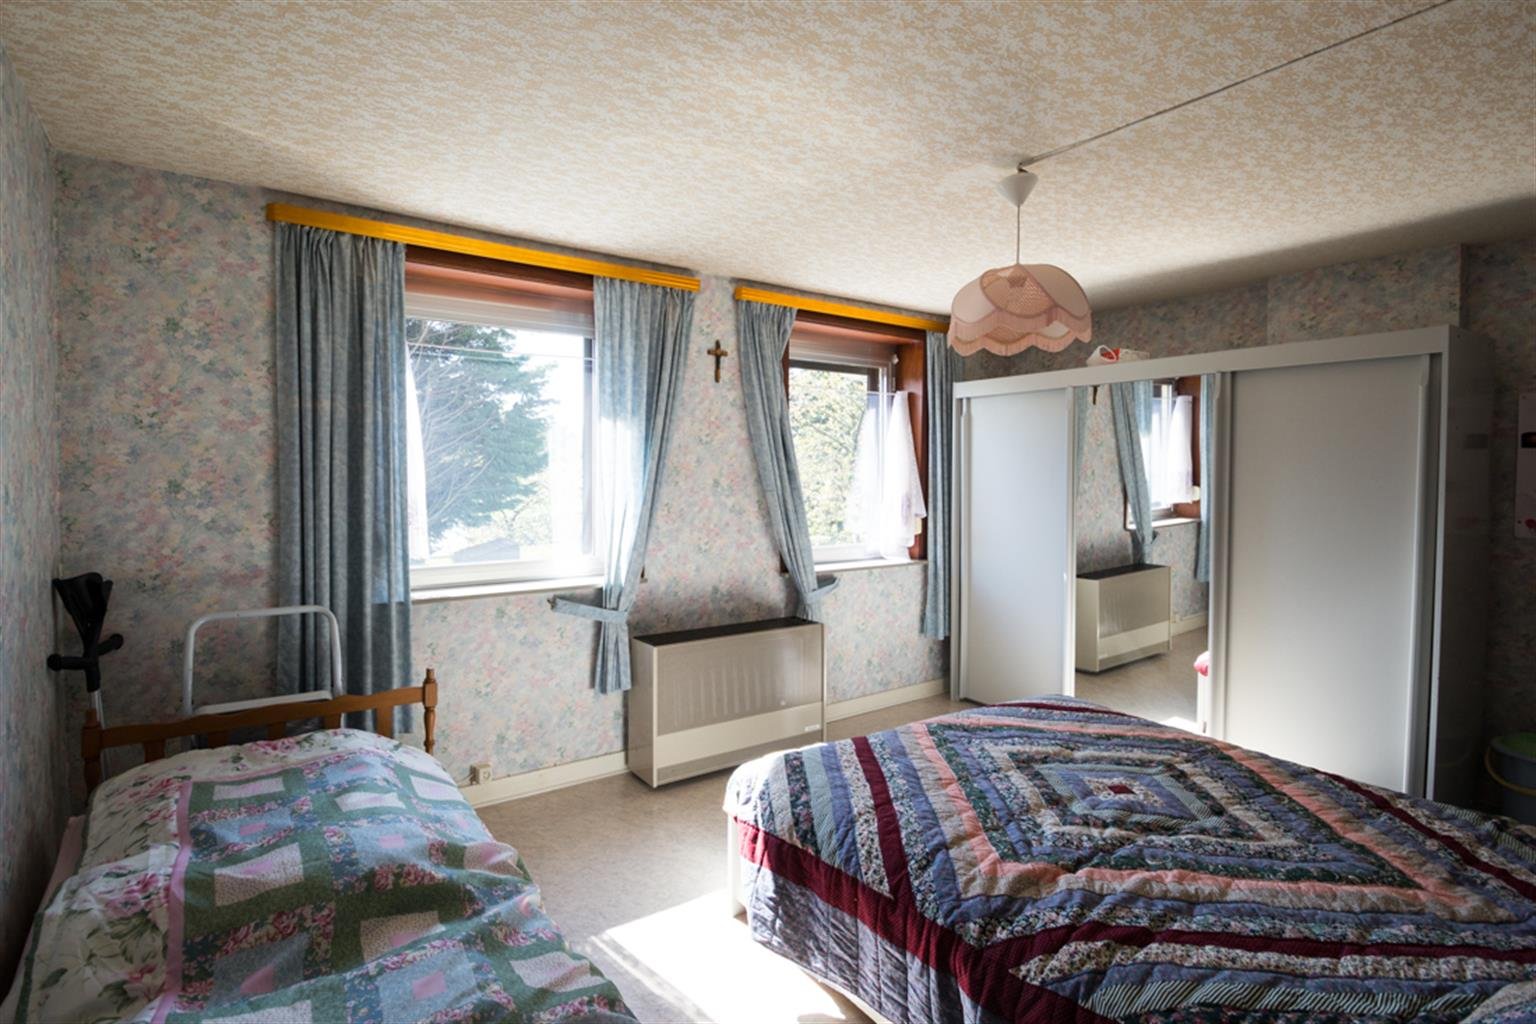 Maison - Leval-Trahegnies - #4345091-13